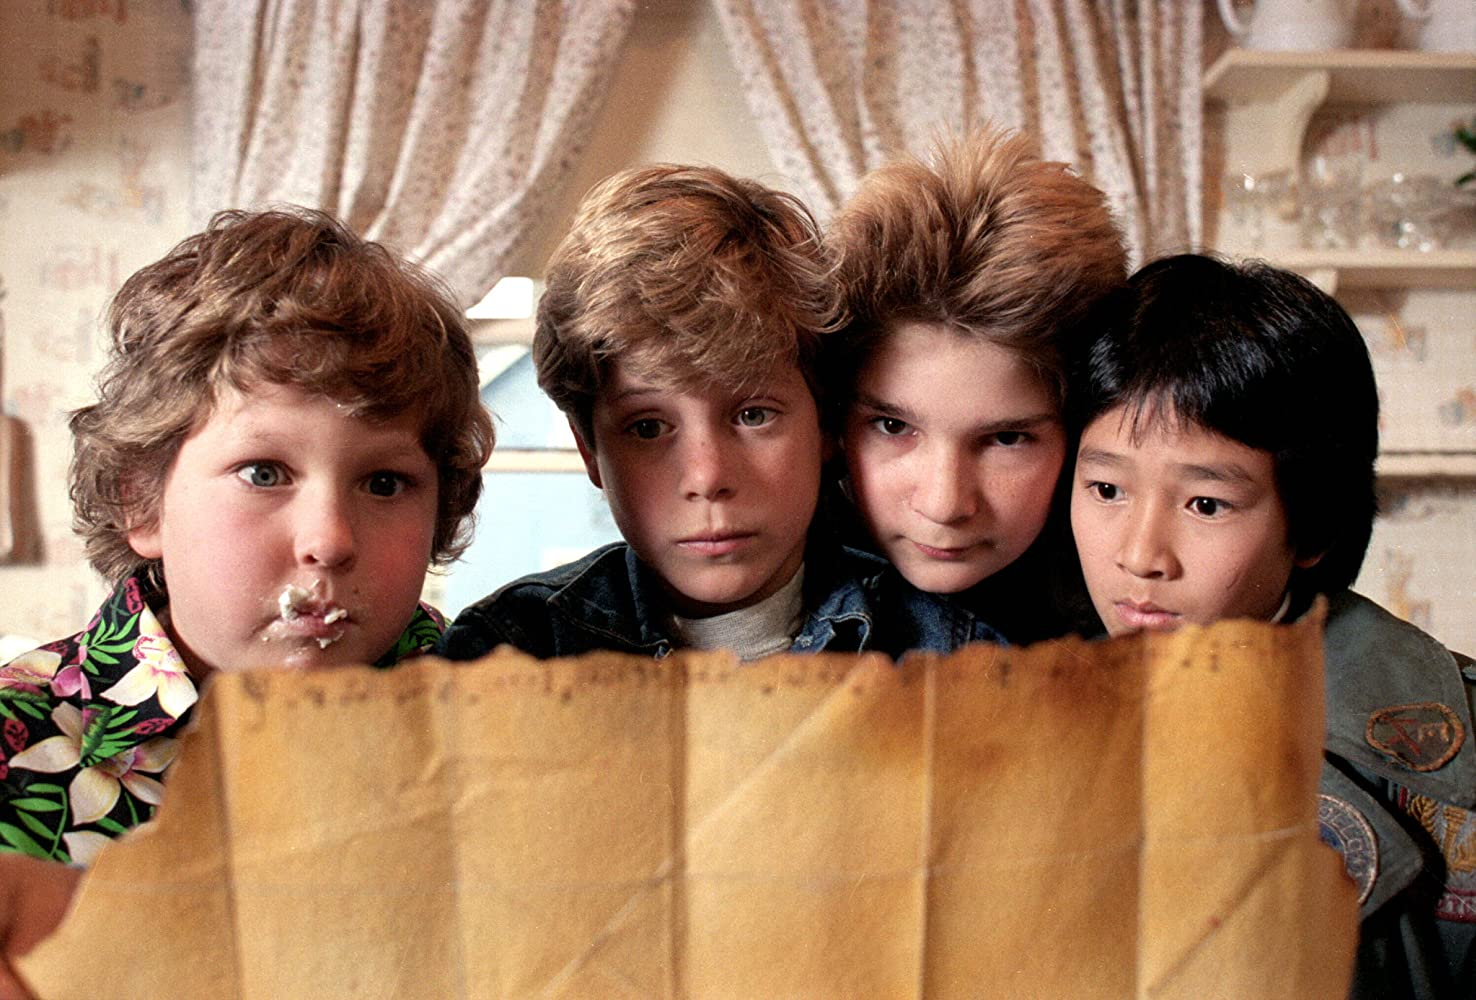 Sean Astin, Corey Feldman, Jeff Cohen, and Ke Huy Quan in The Goonies (1985)